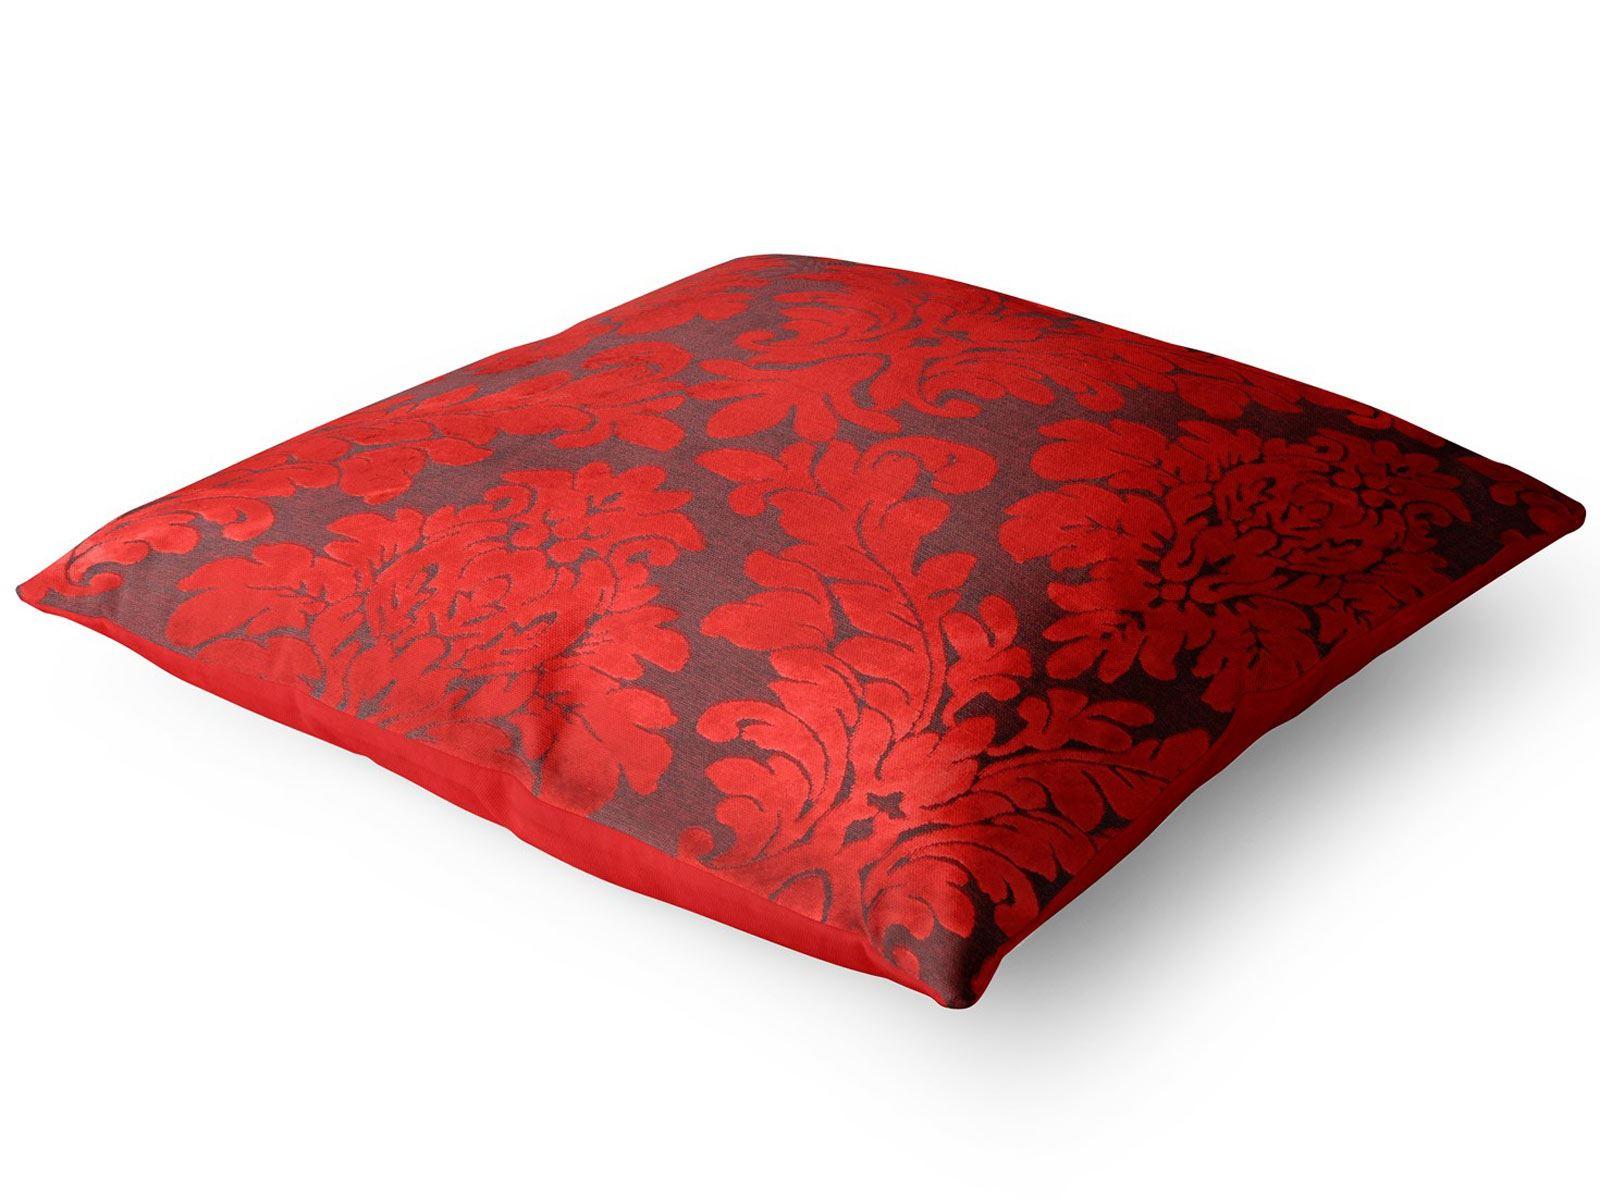 Vino-Tinto-Cushion-Covers-Coleccion-17-034-18-034-43cm-45cm-Cubierta miniatura 15